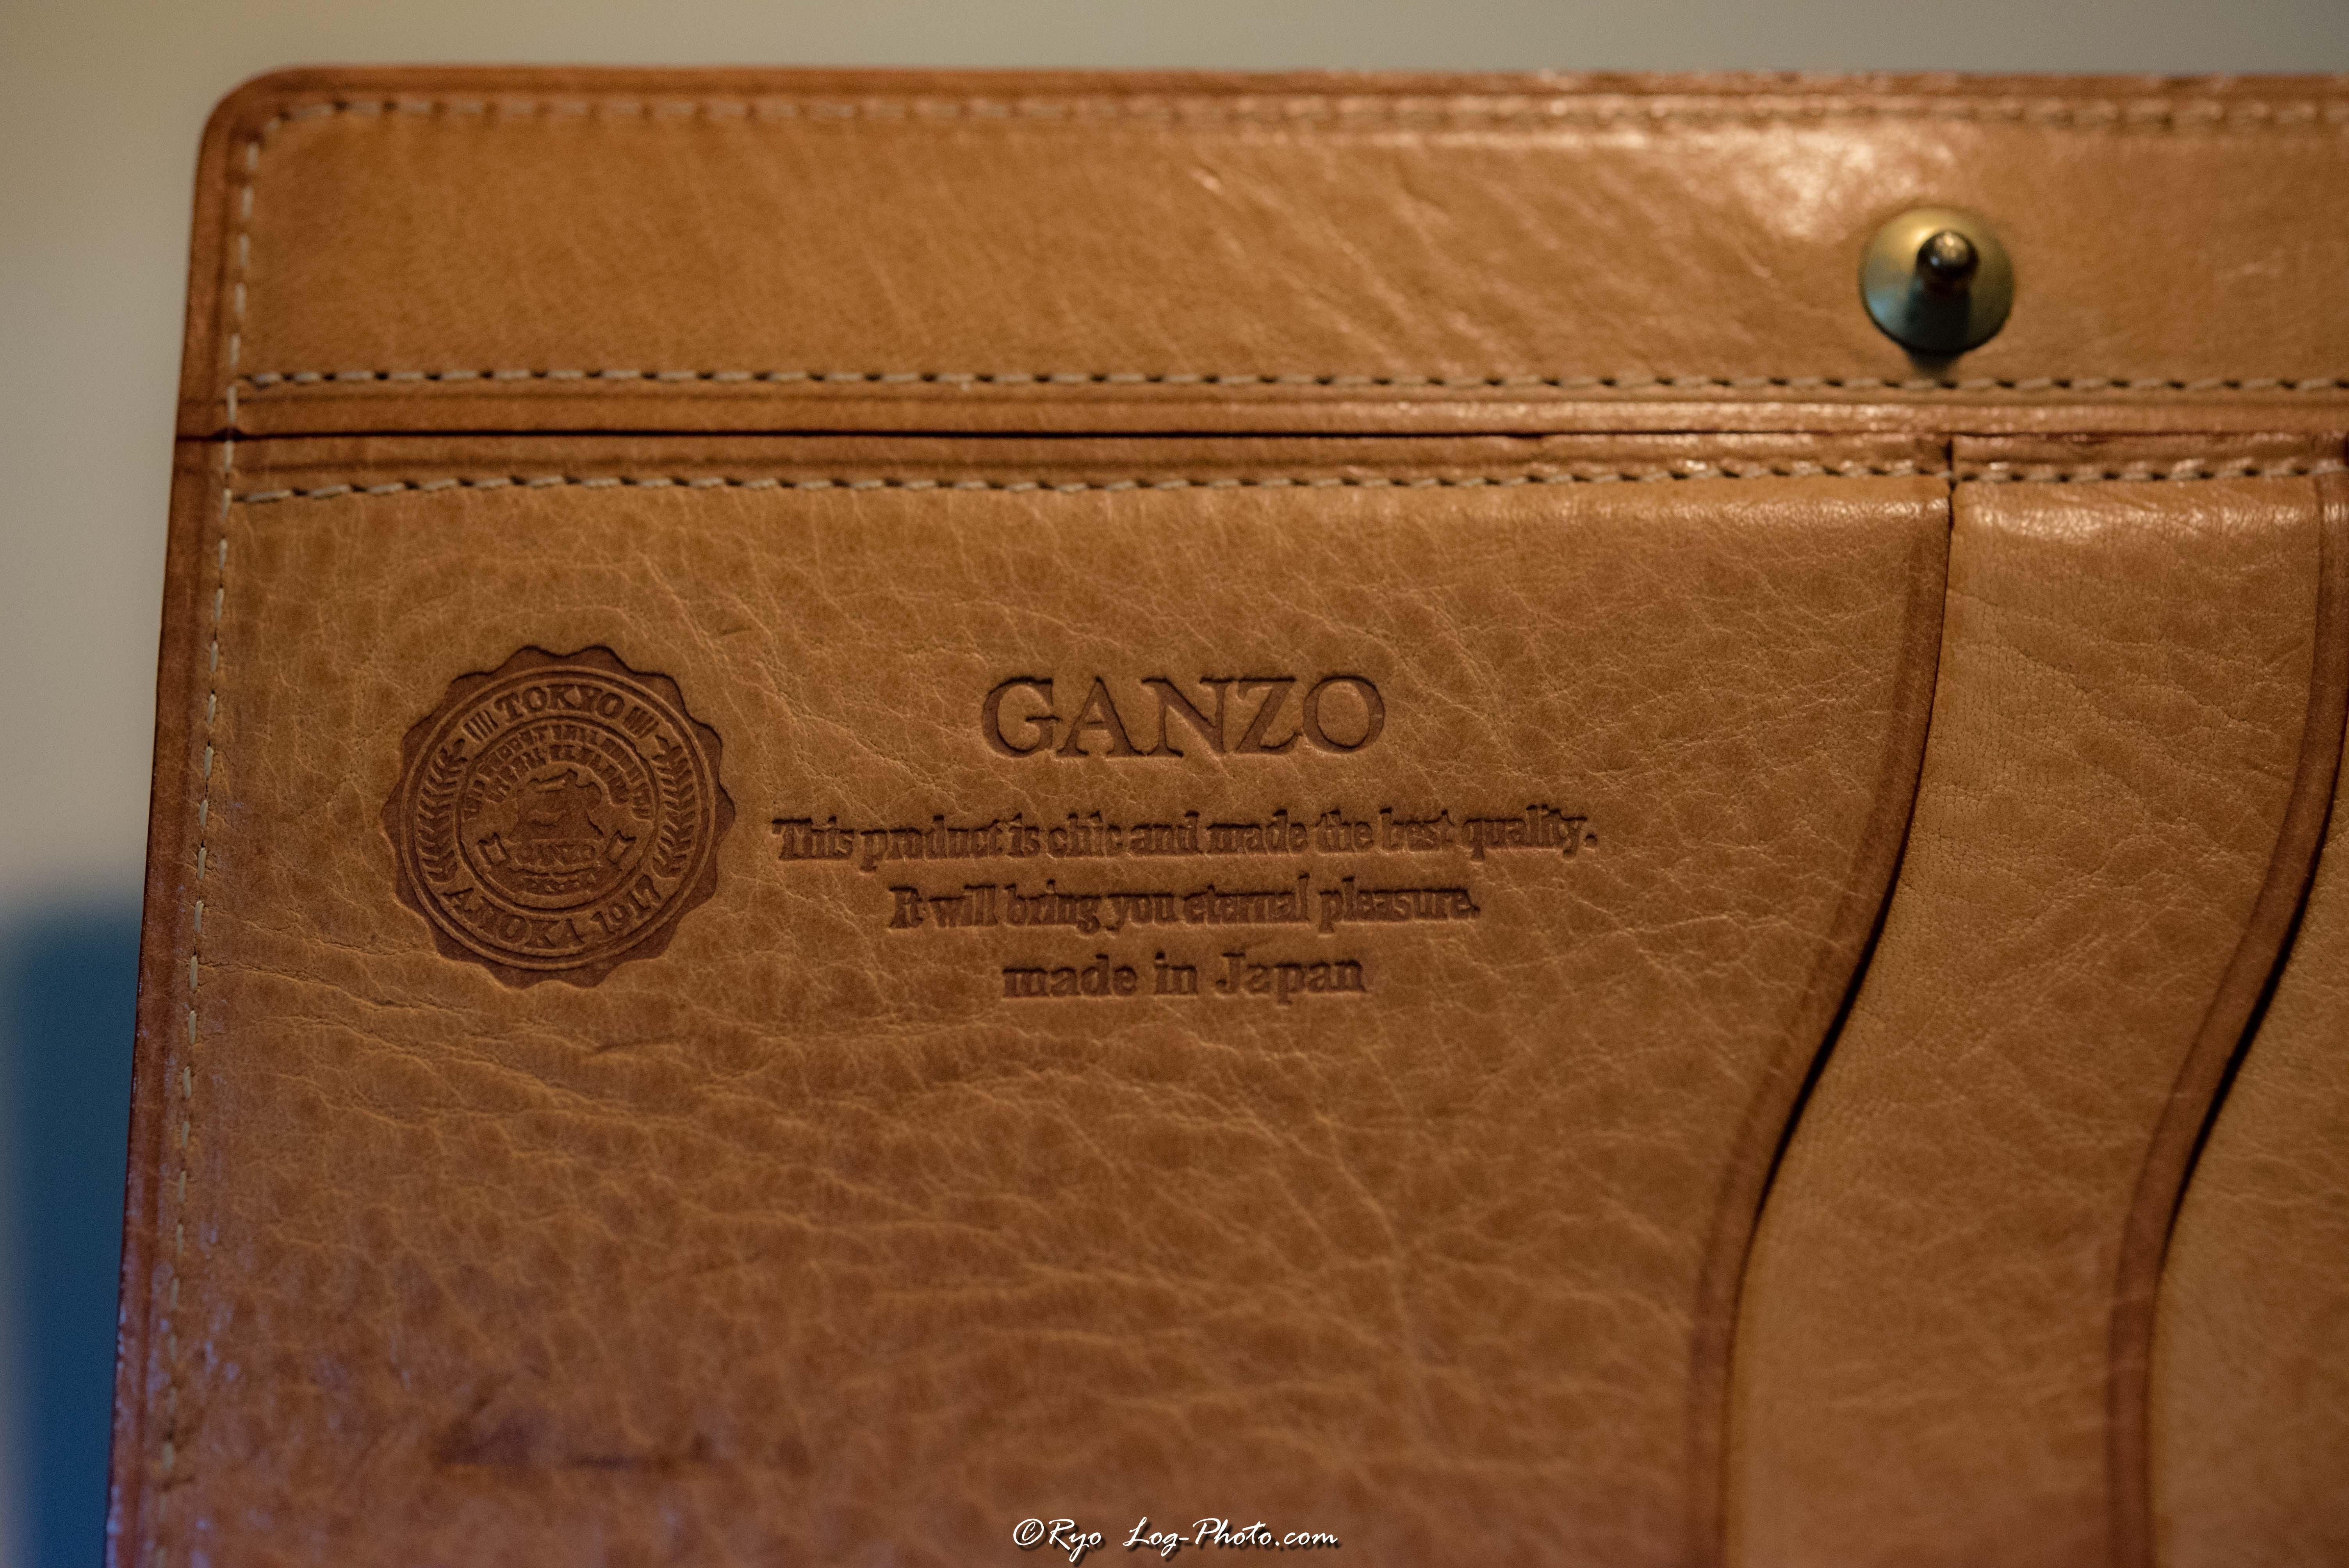 ganzo(ガンゾ)のブライドルレザー 財布 経年変化